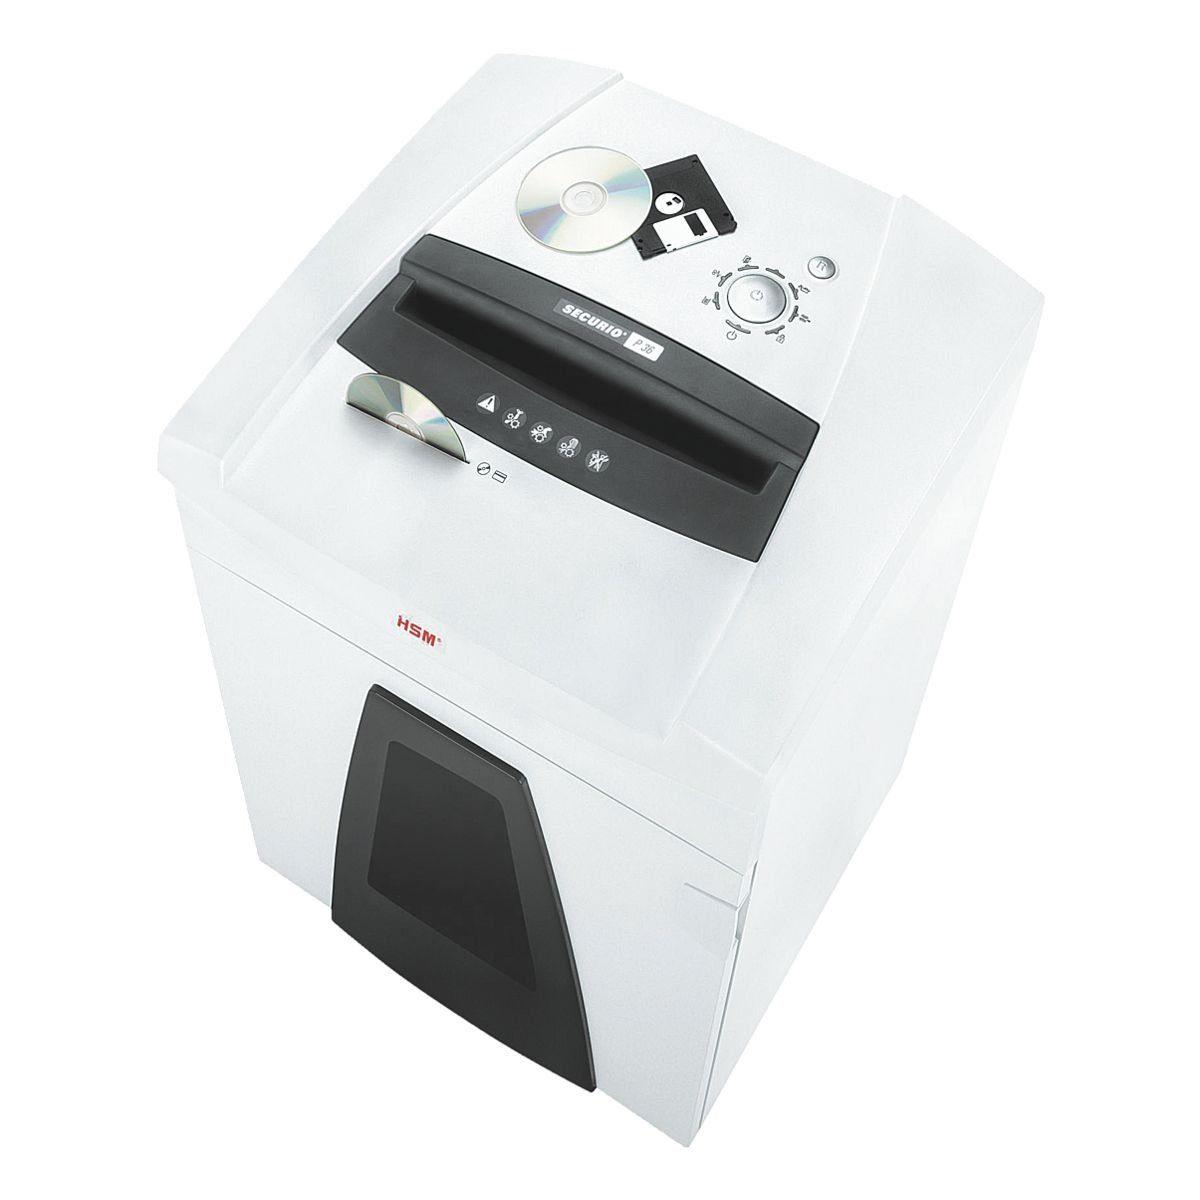 HSM Aktenvernichter »Securio P36 1,9x15mm«